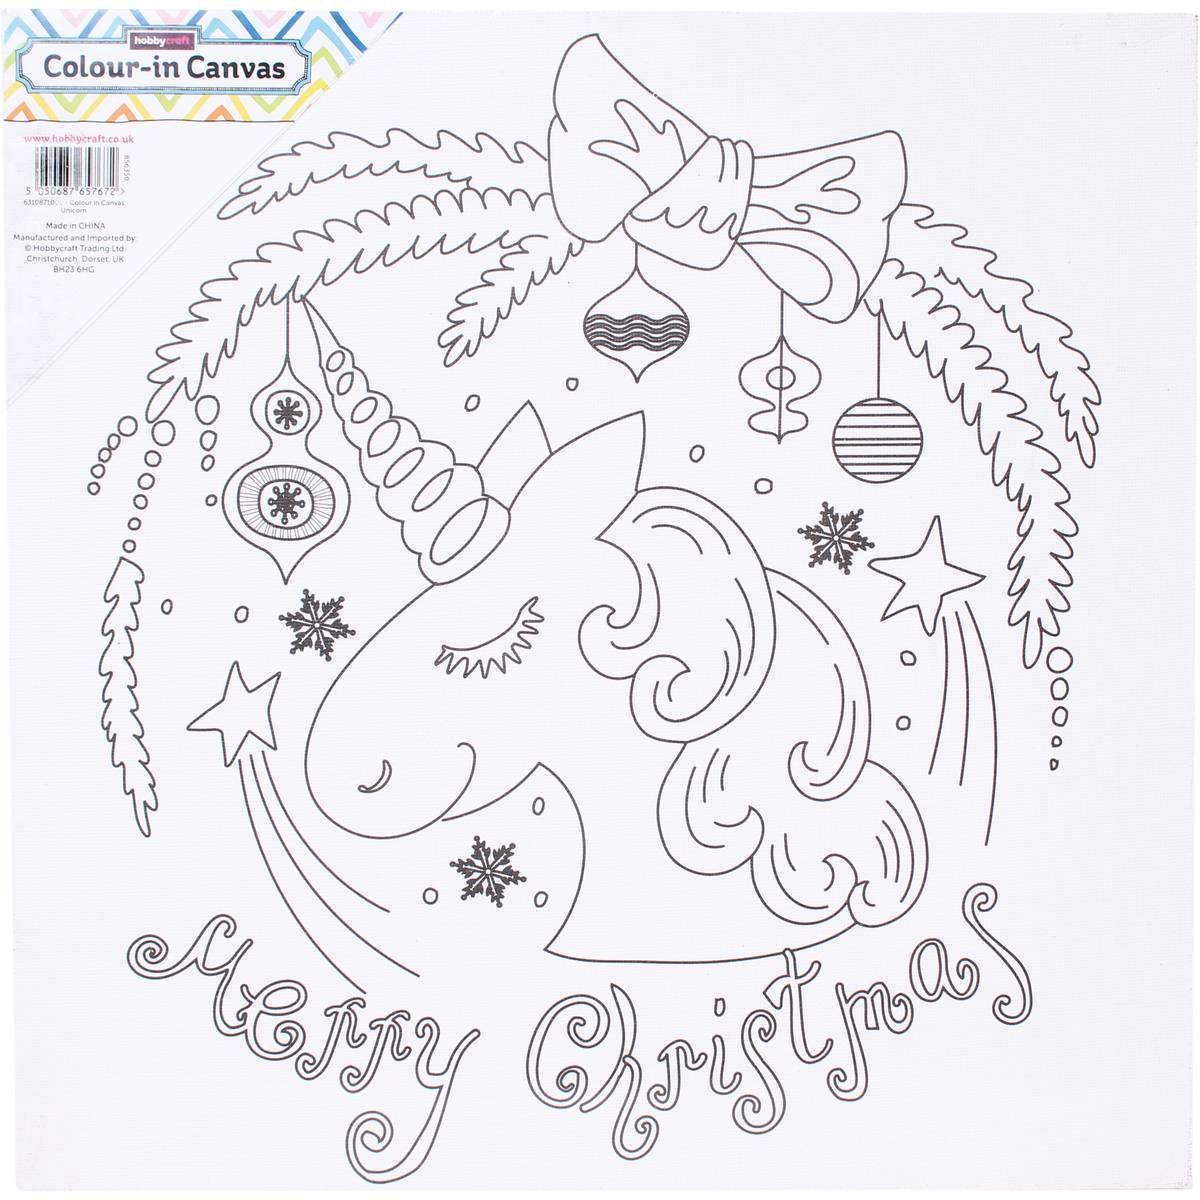 Pin By Telva Mm On Unicornios Unicorns And Mermaids Christmas Unicorn Kids Blanks